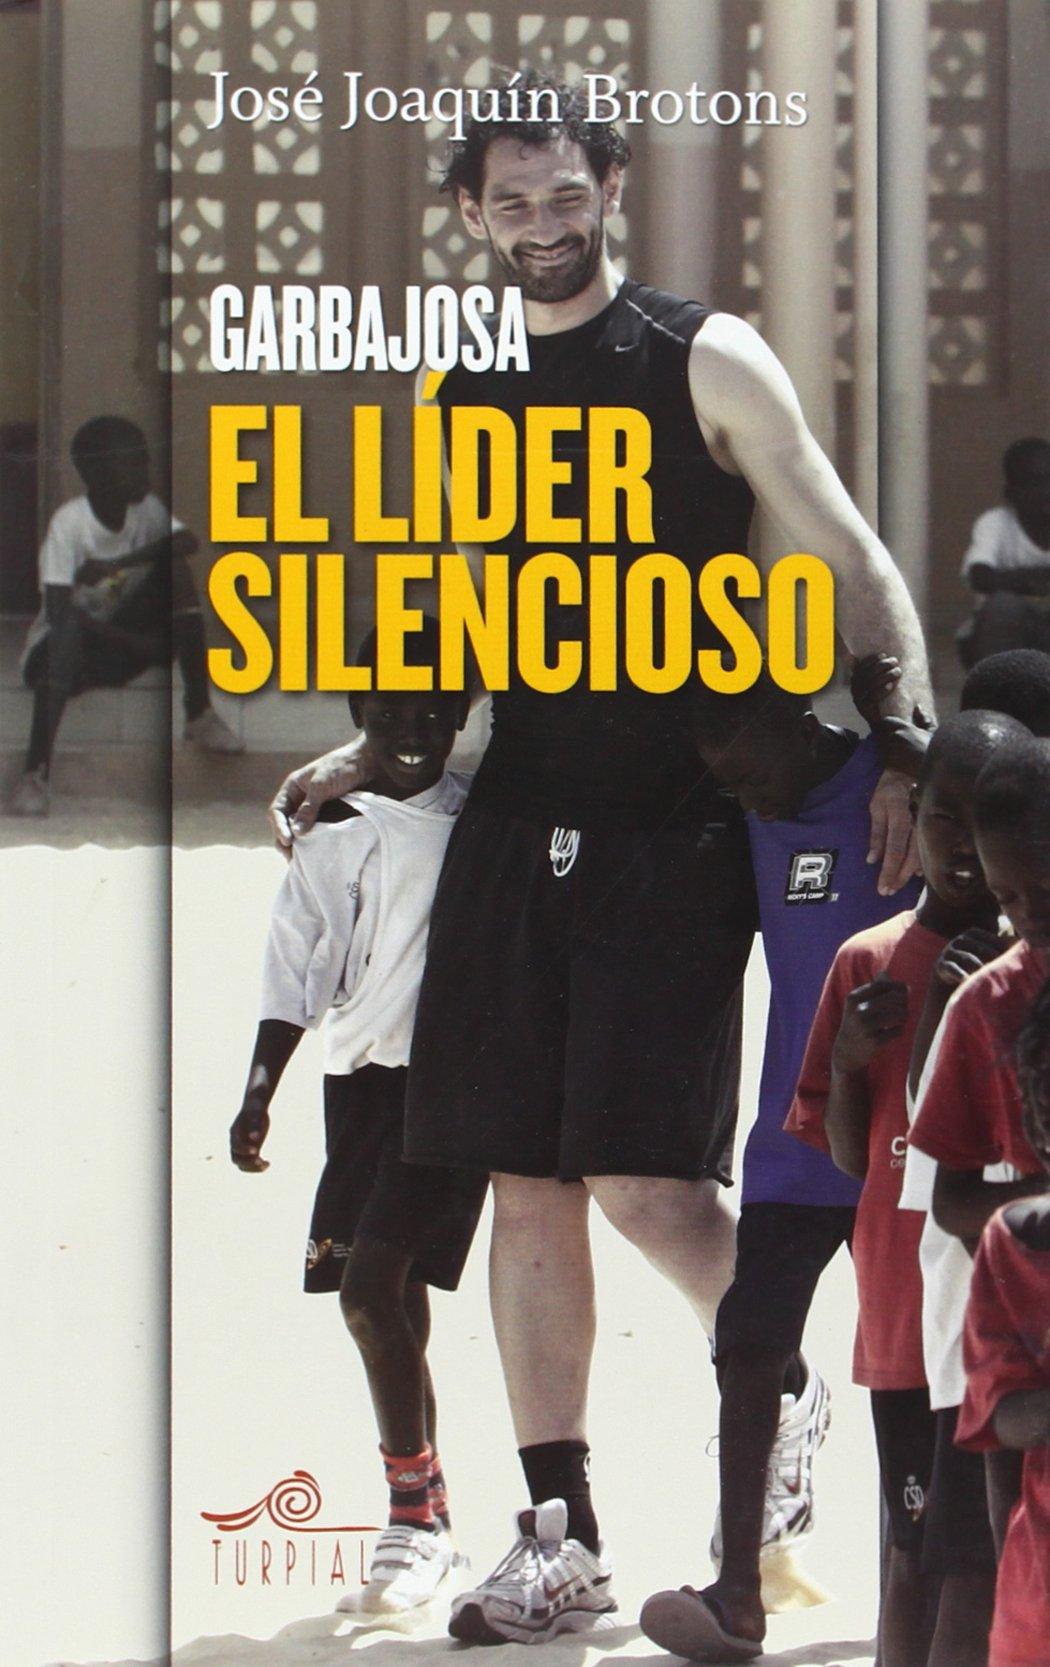 Garbajosa, el lider silencioso (Mirador) Tapa blanda – 31 may 2014 Jose Joaquin Brotons Turpial 8495157713 Basketball